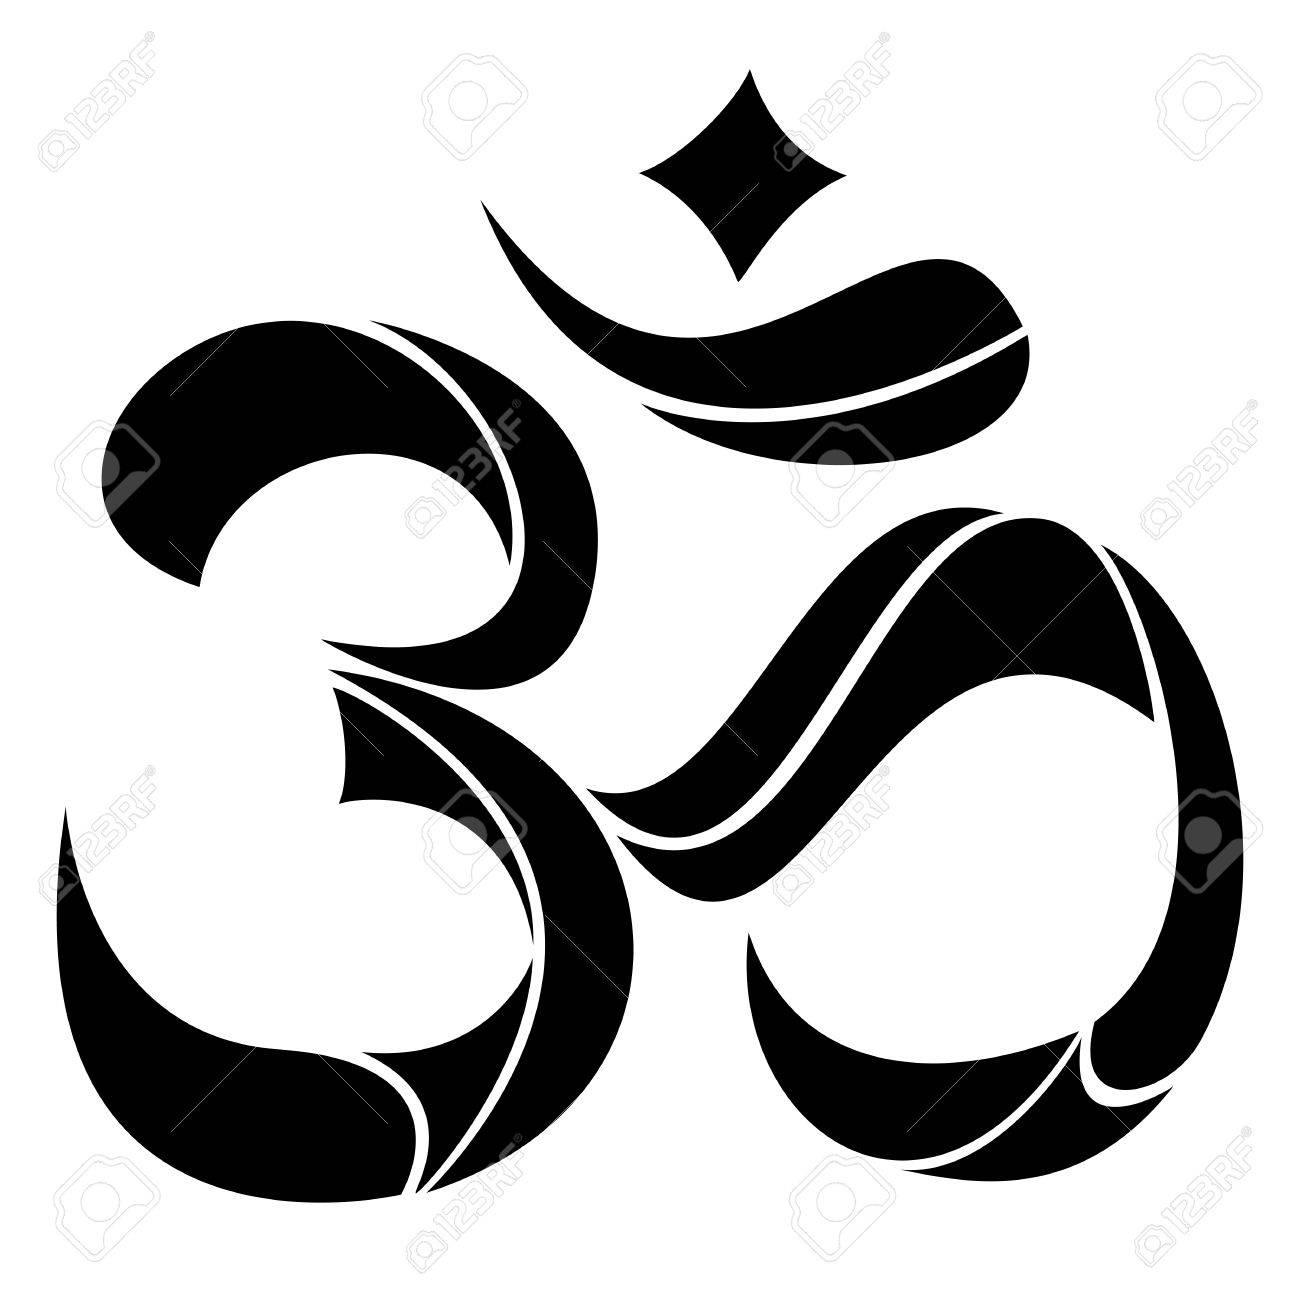 Om symbol Yoga or Pranava